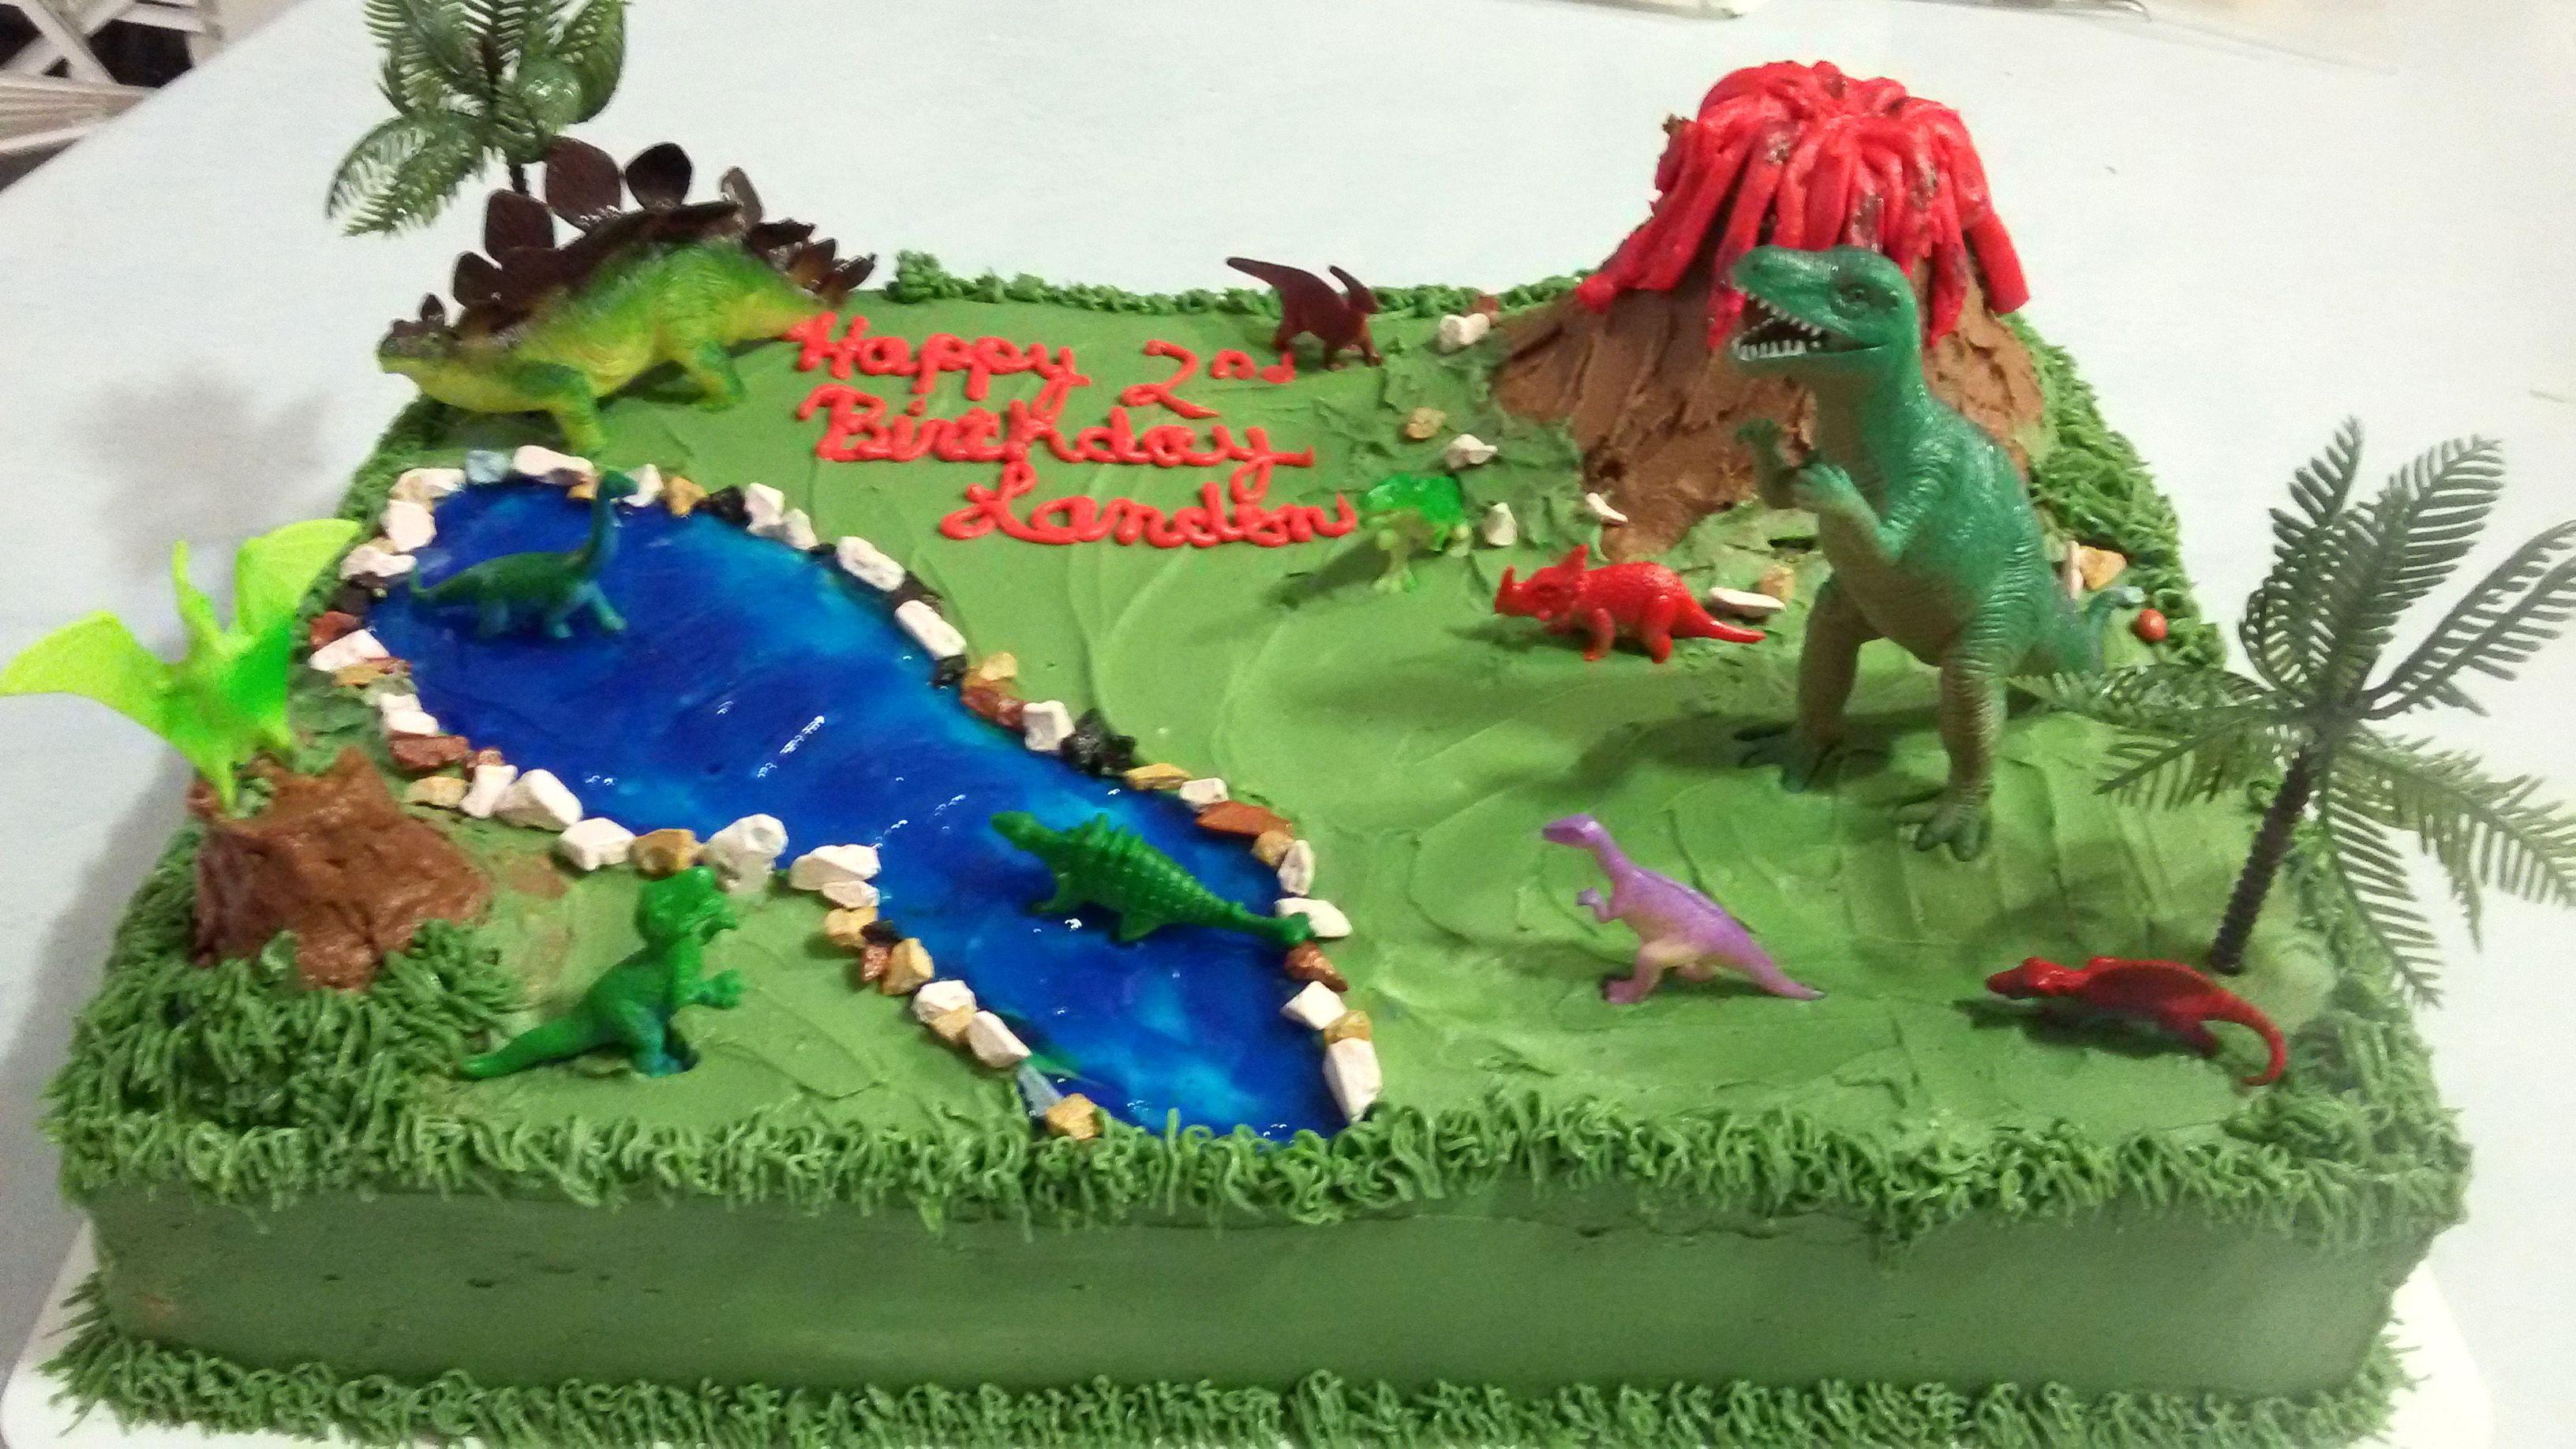 Dinosaurs 1 2 Sheet Cake 1 2 Chocolate W Banana Cream Filling 1